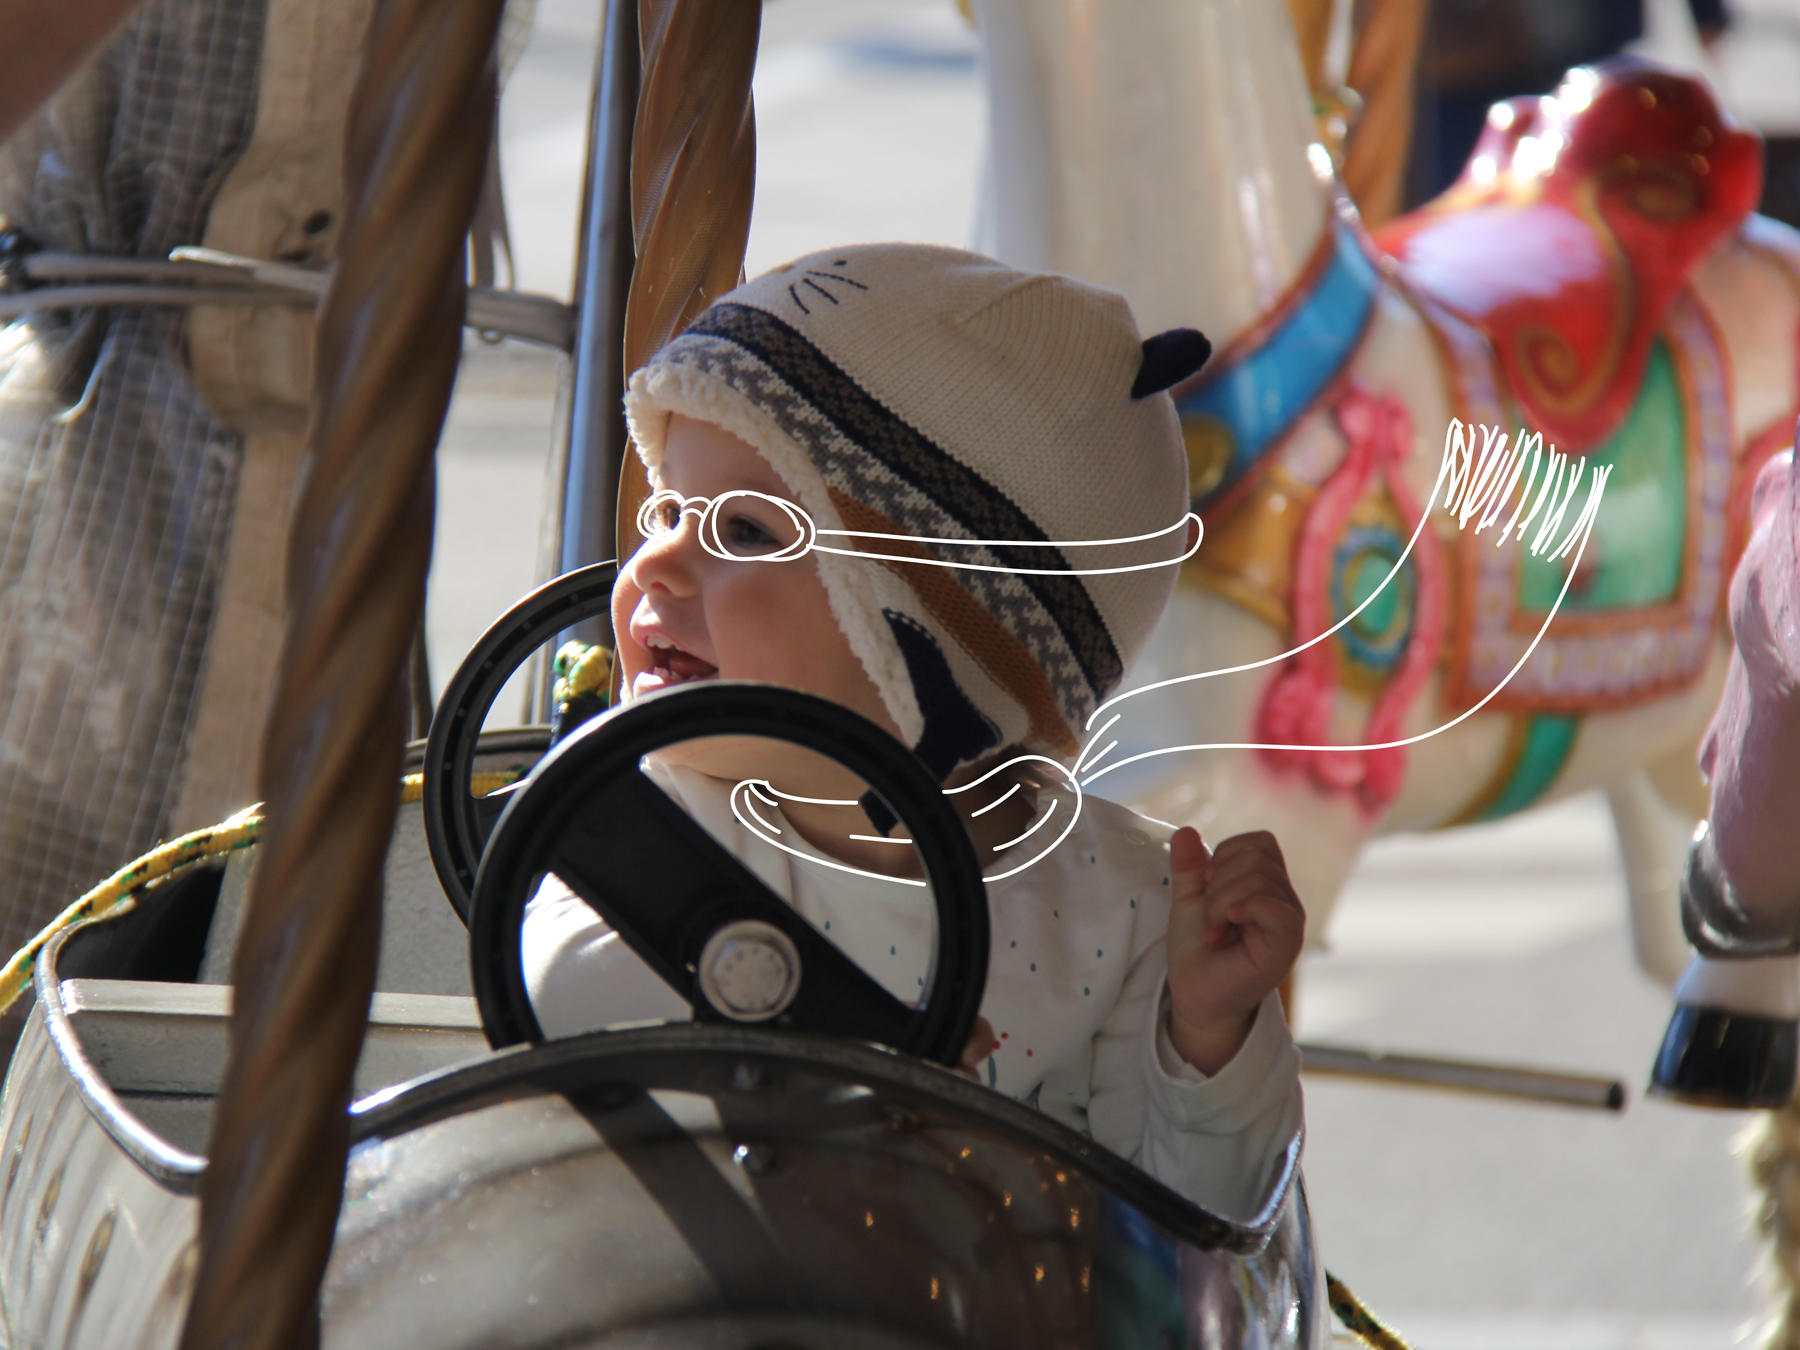 Lucie aviatrice de l'extrême